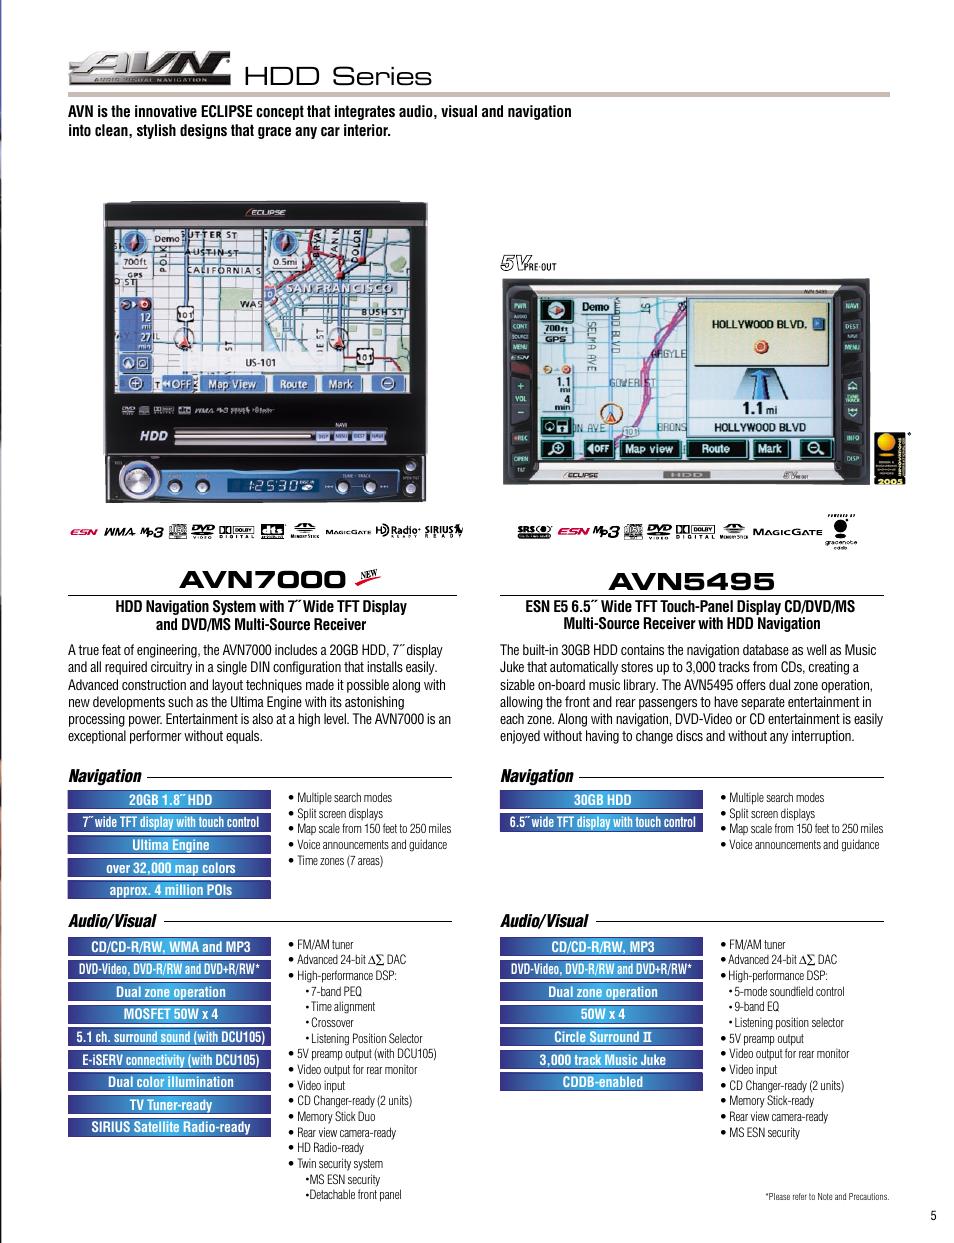 Fujitsu Self Scan Wiring Diagram Wire Data Schema Eclipse Avn5500 Check Map 1999 Toyota Radio Ten